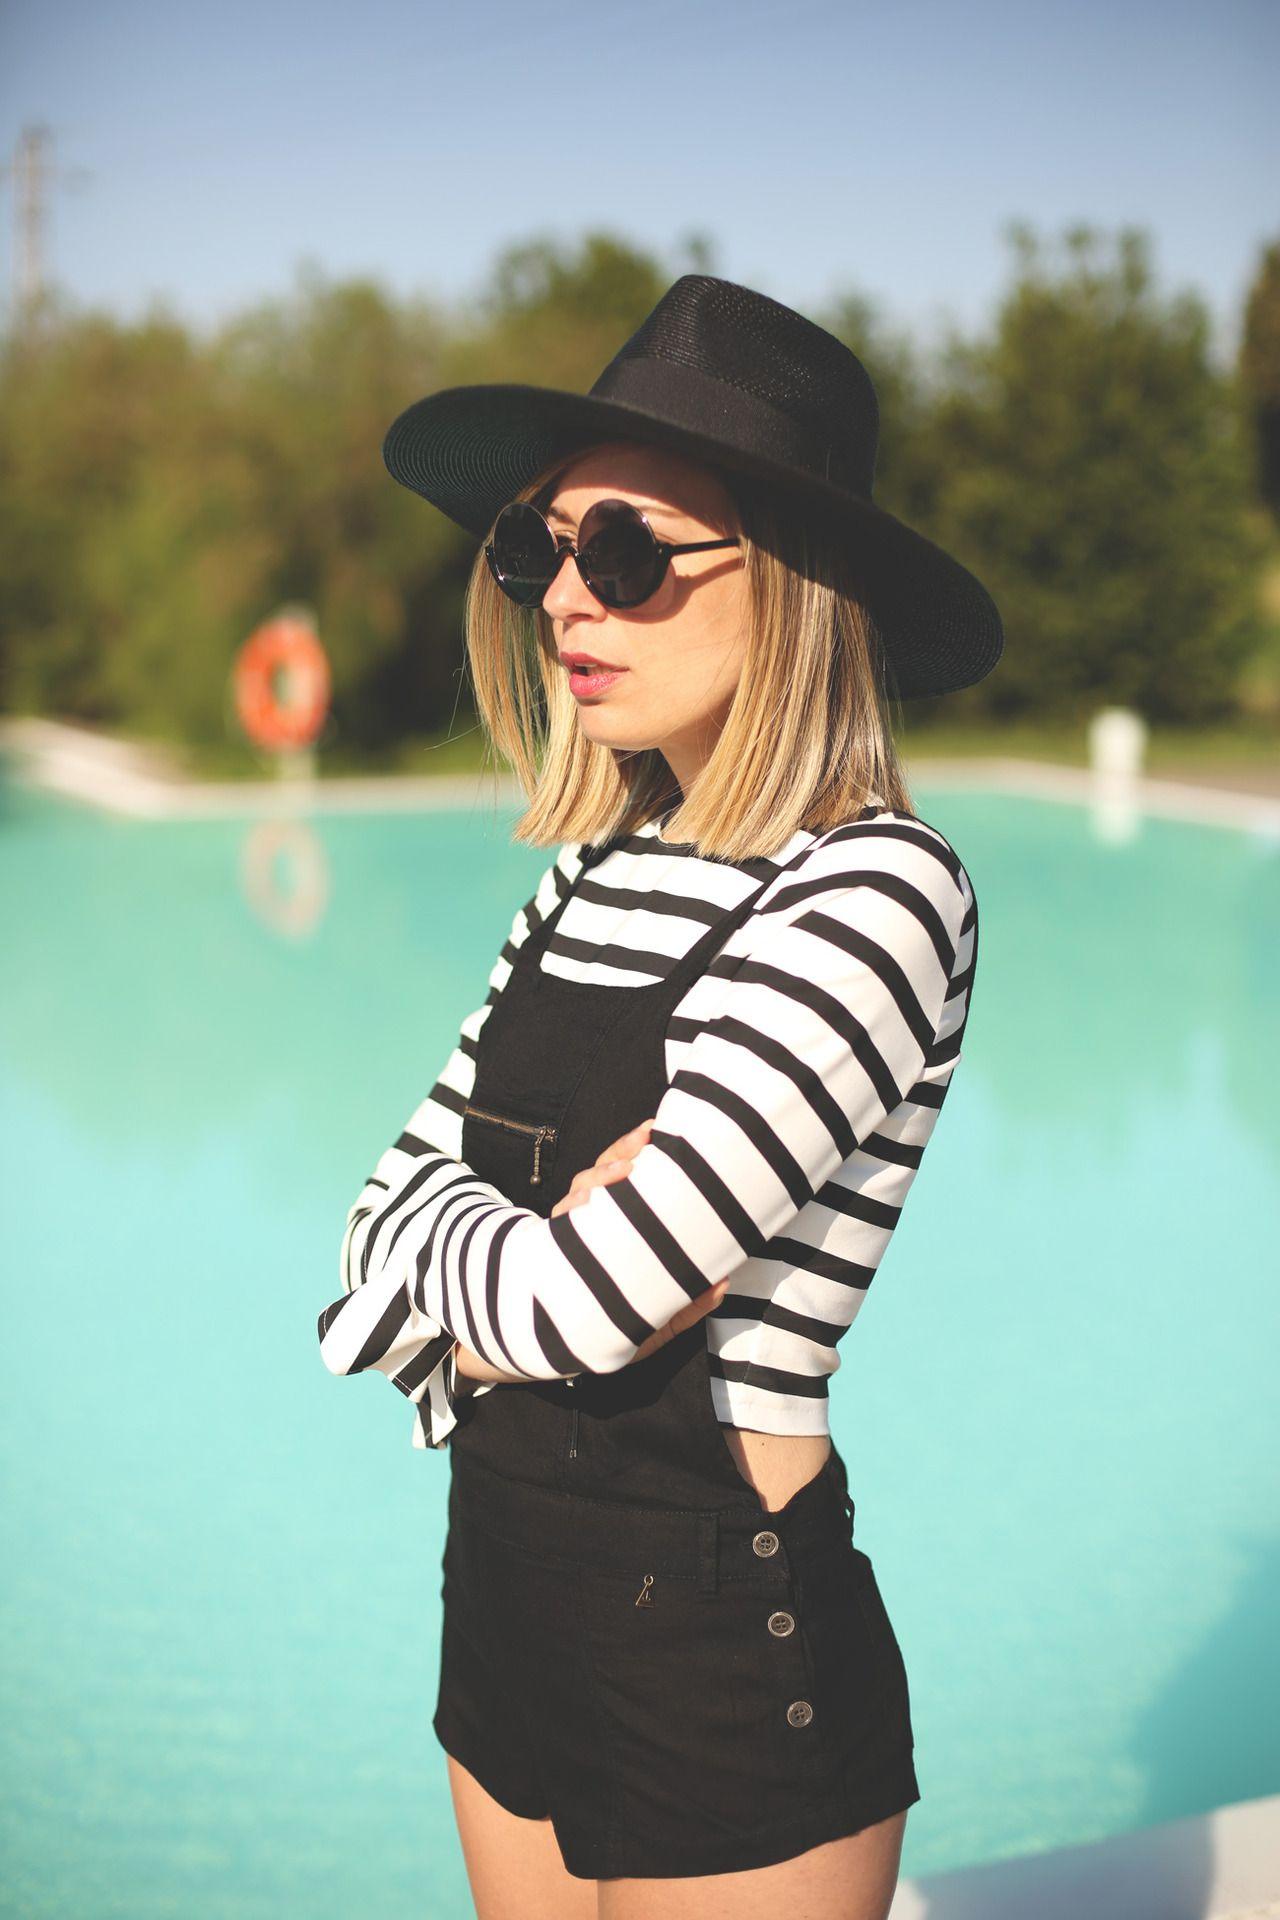 Resultado de imagen para dress and hat outfit tumblr